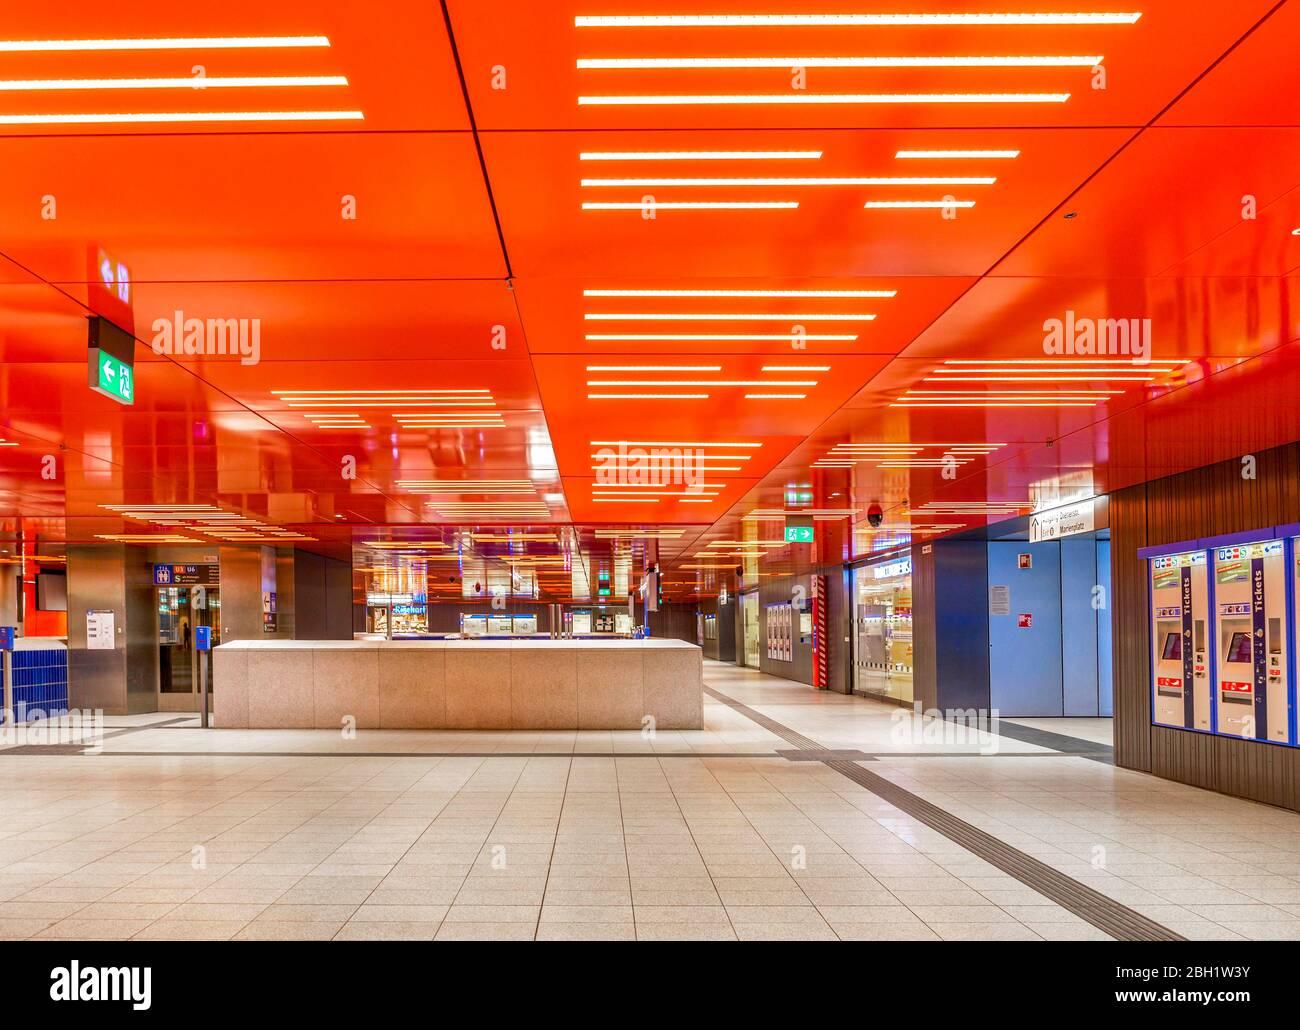 Empty basement during the day, access to subway, corona crisis, Marienplatz, Munich, Upper Bavaria, Bavaria, Germany, Europe Stock Photo